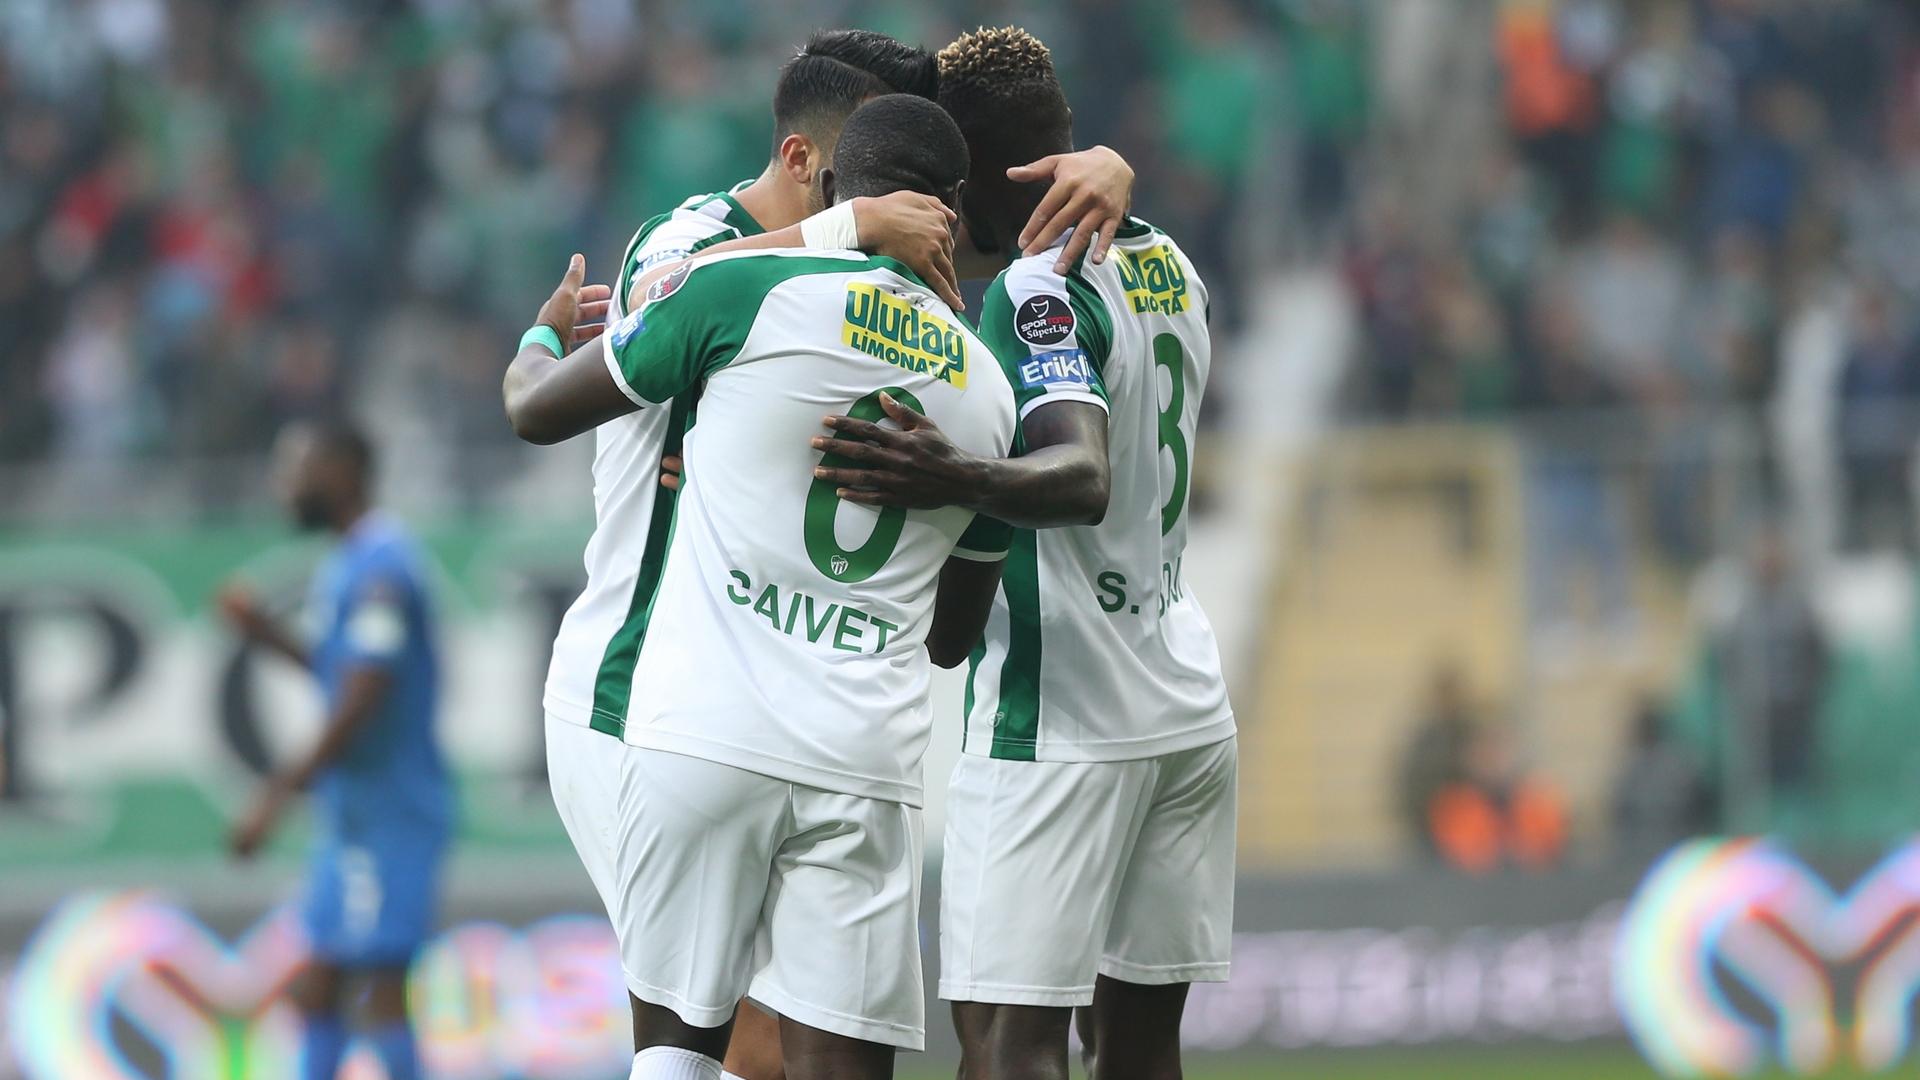 Belgian club Oostende sign former Bursaspor defender Vieux Sane